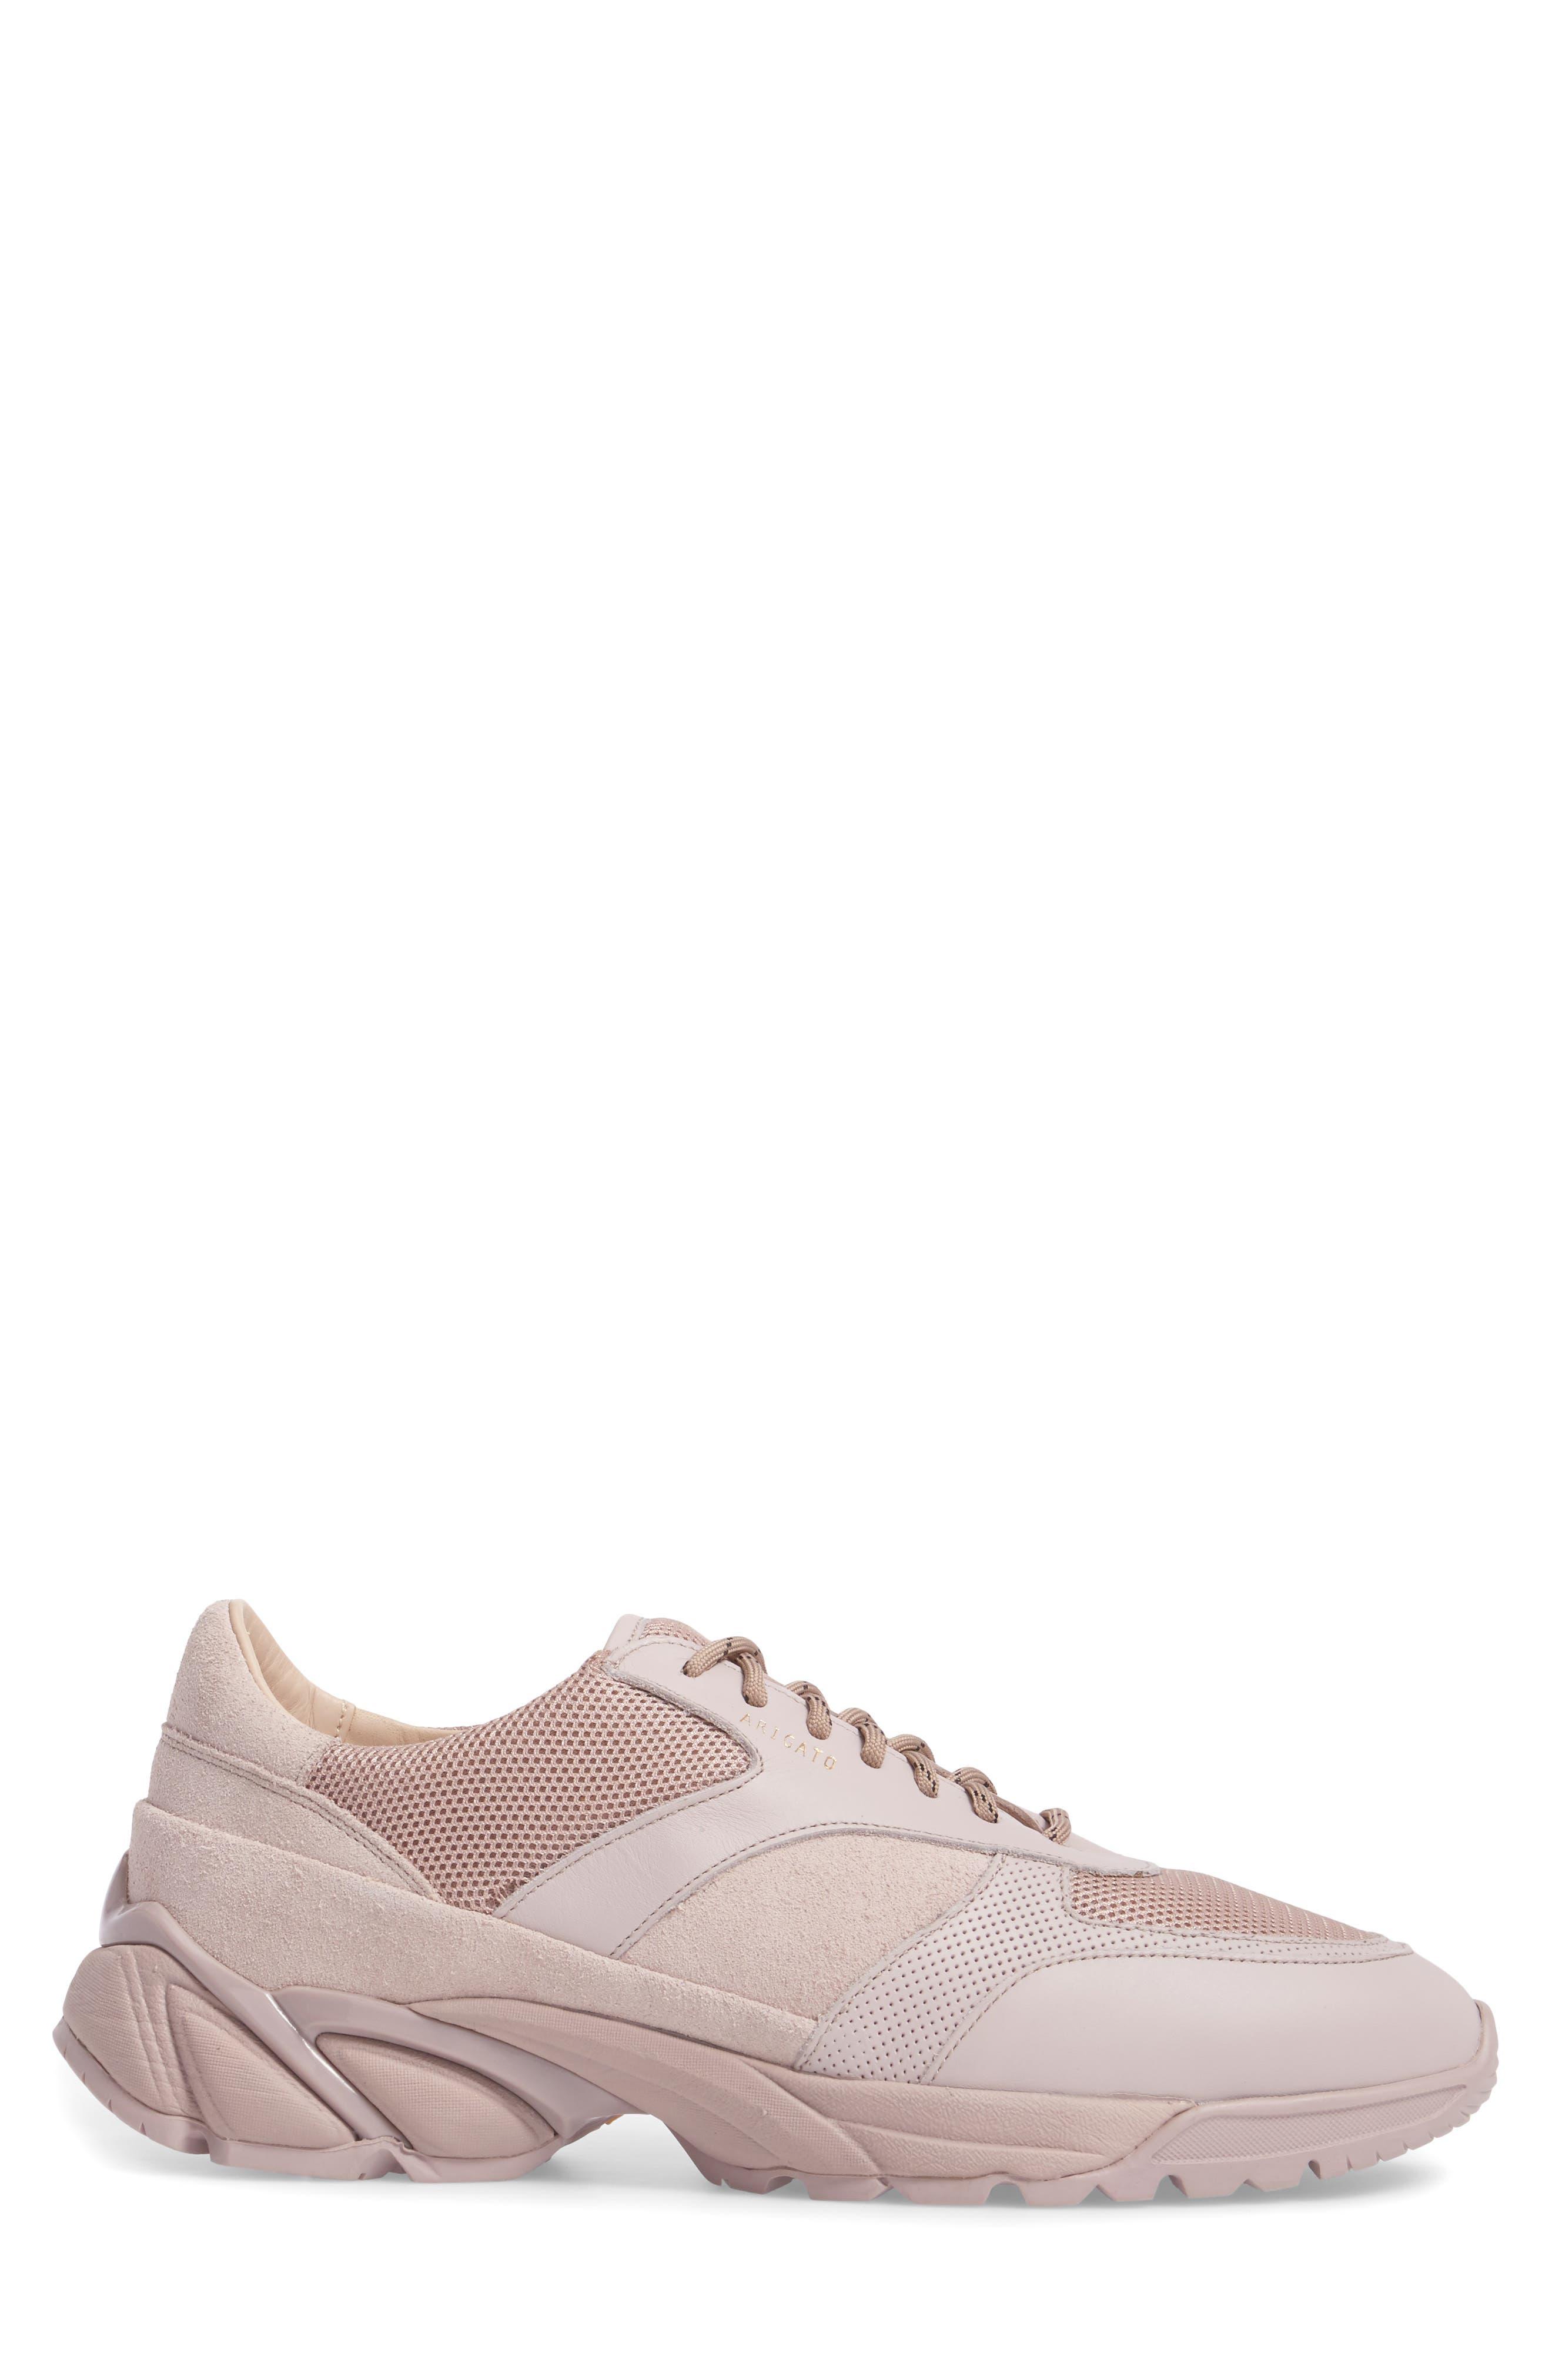 Tech Sneaker,                             Alternate thumbnail 3, color,                             650